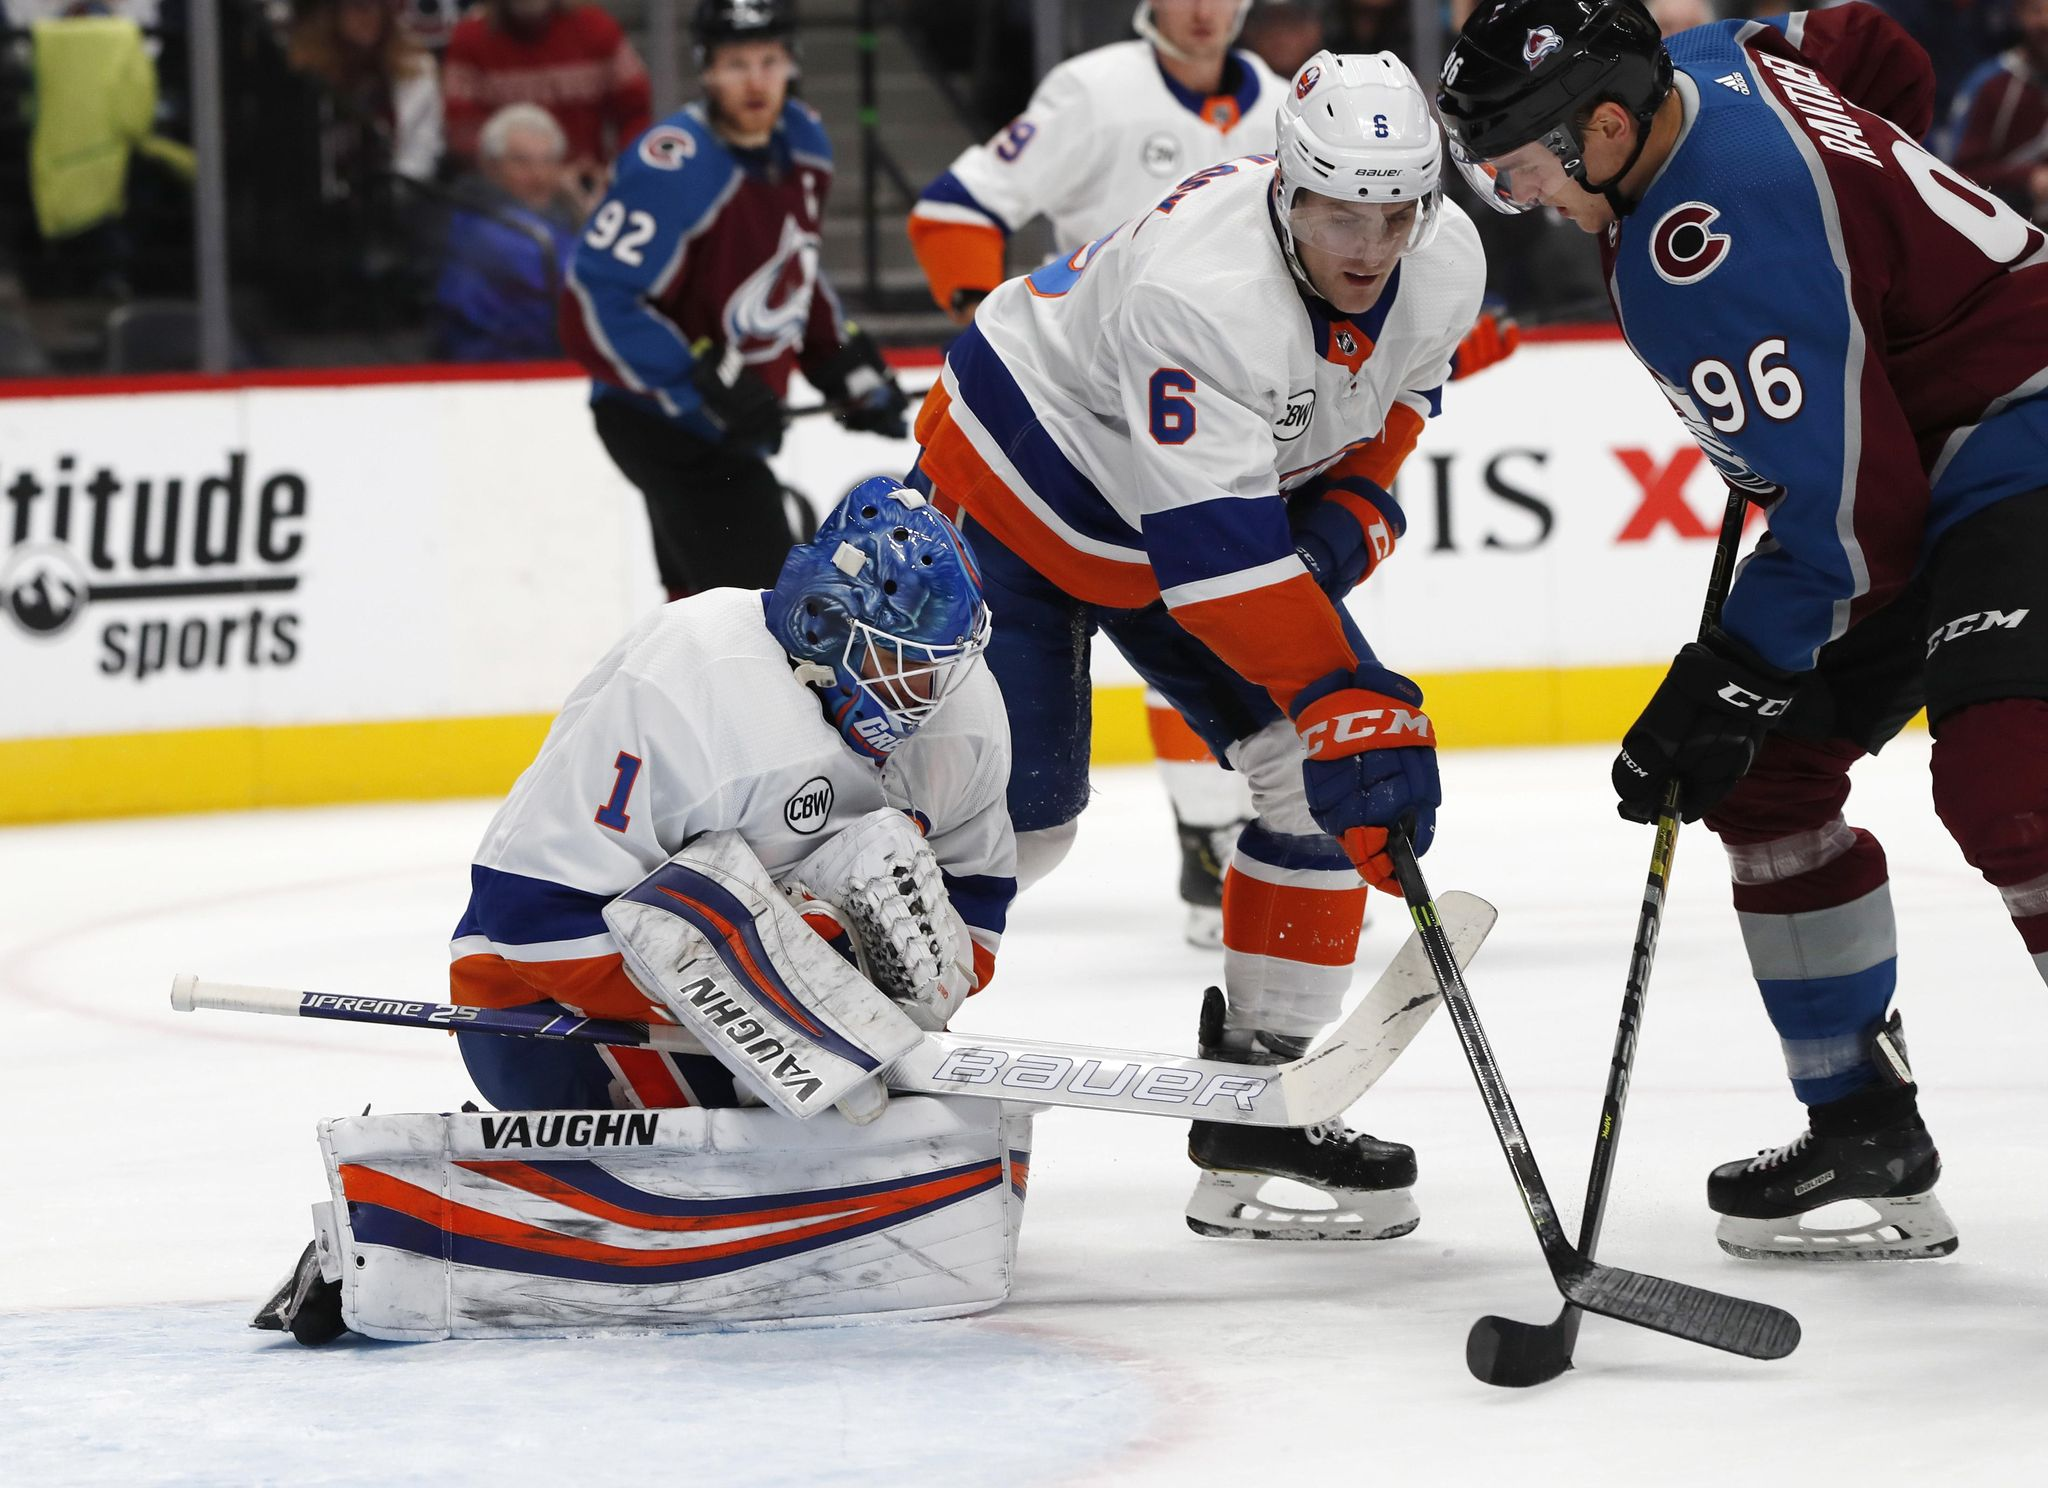 Islanders_avalanche_hockey_31372_s2048x1488